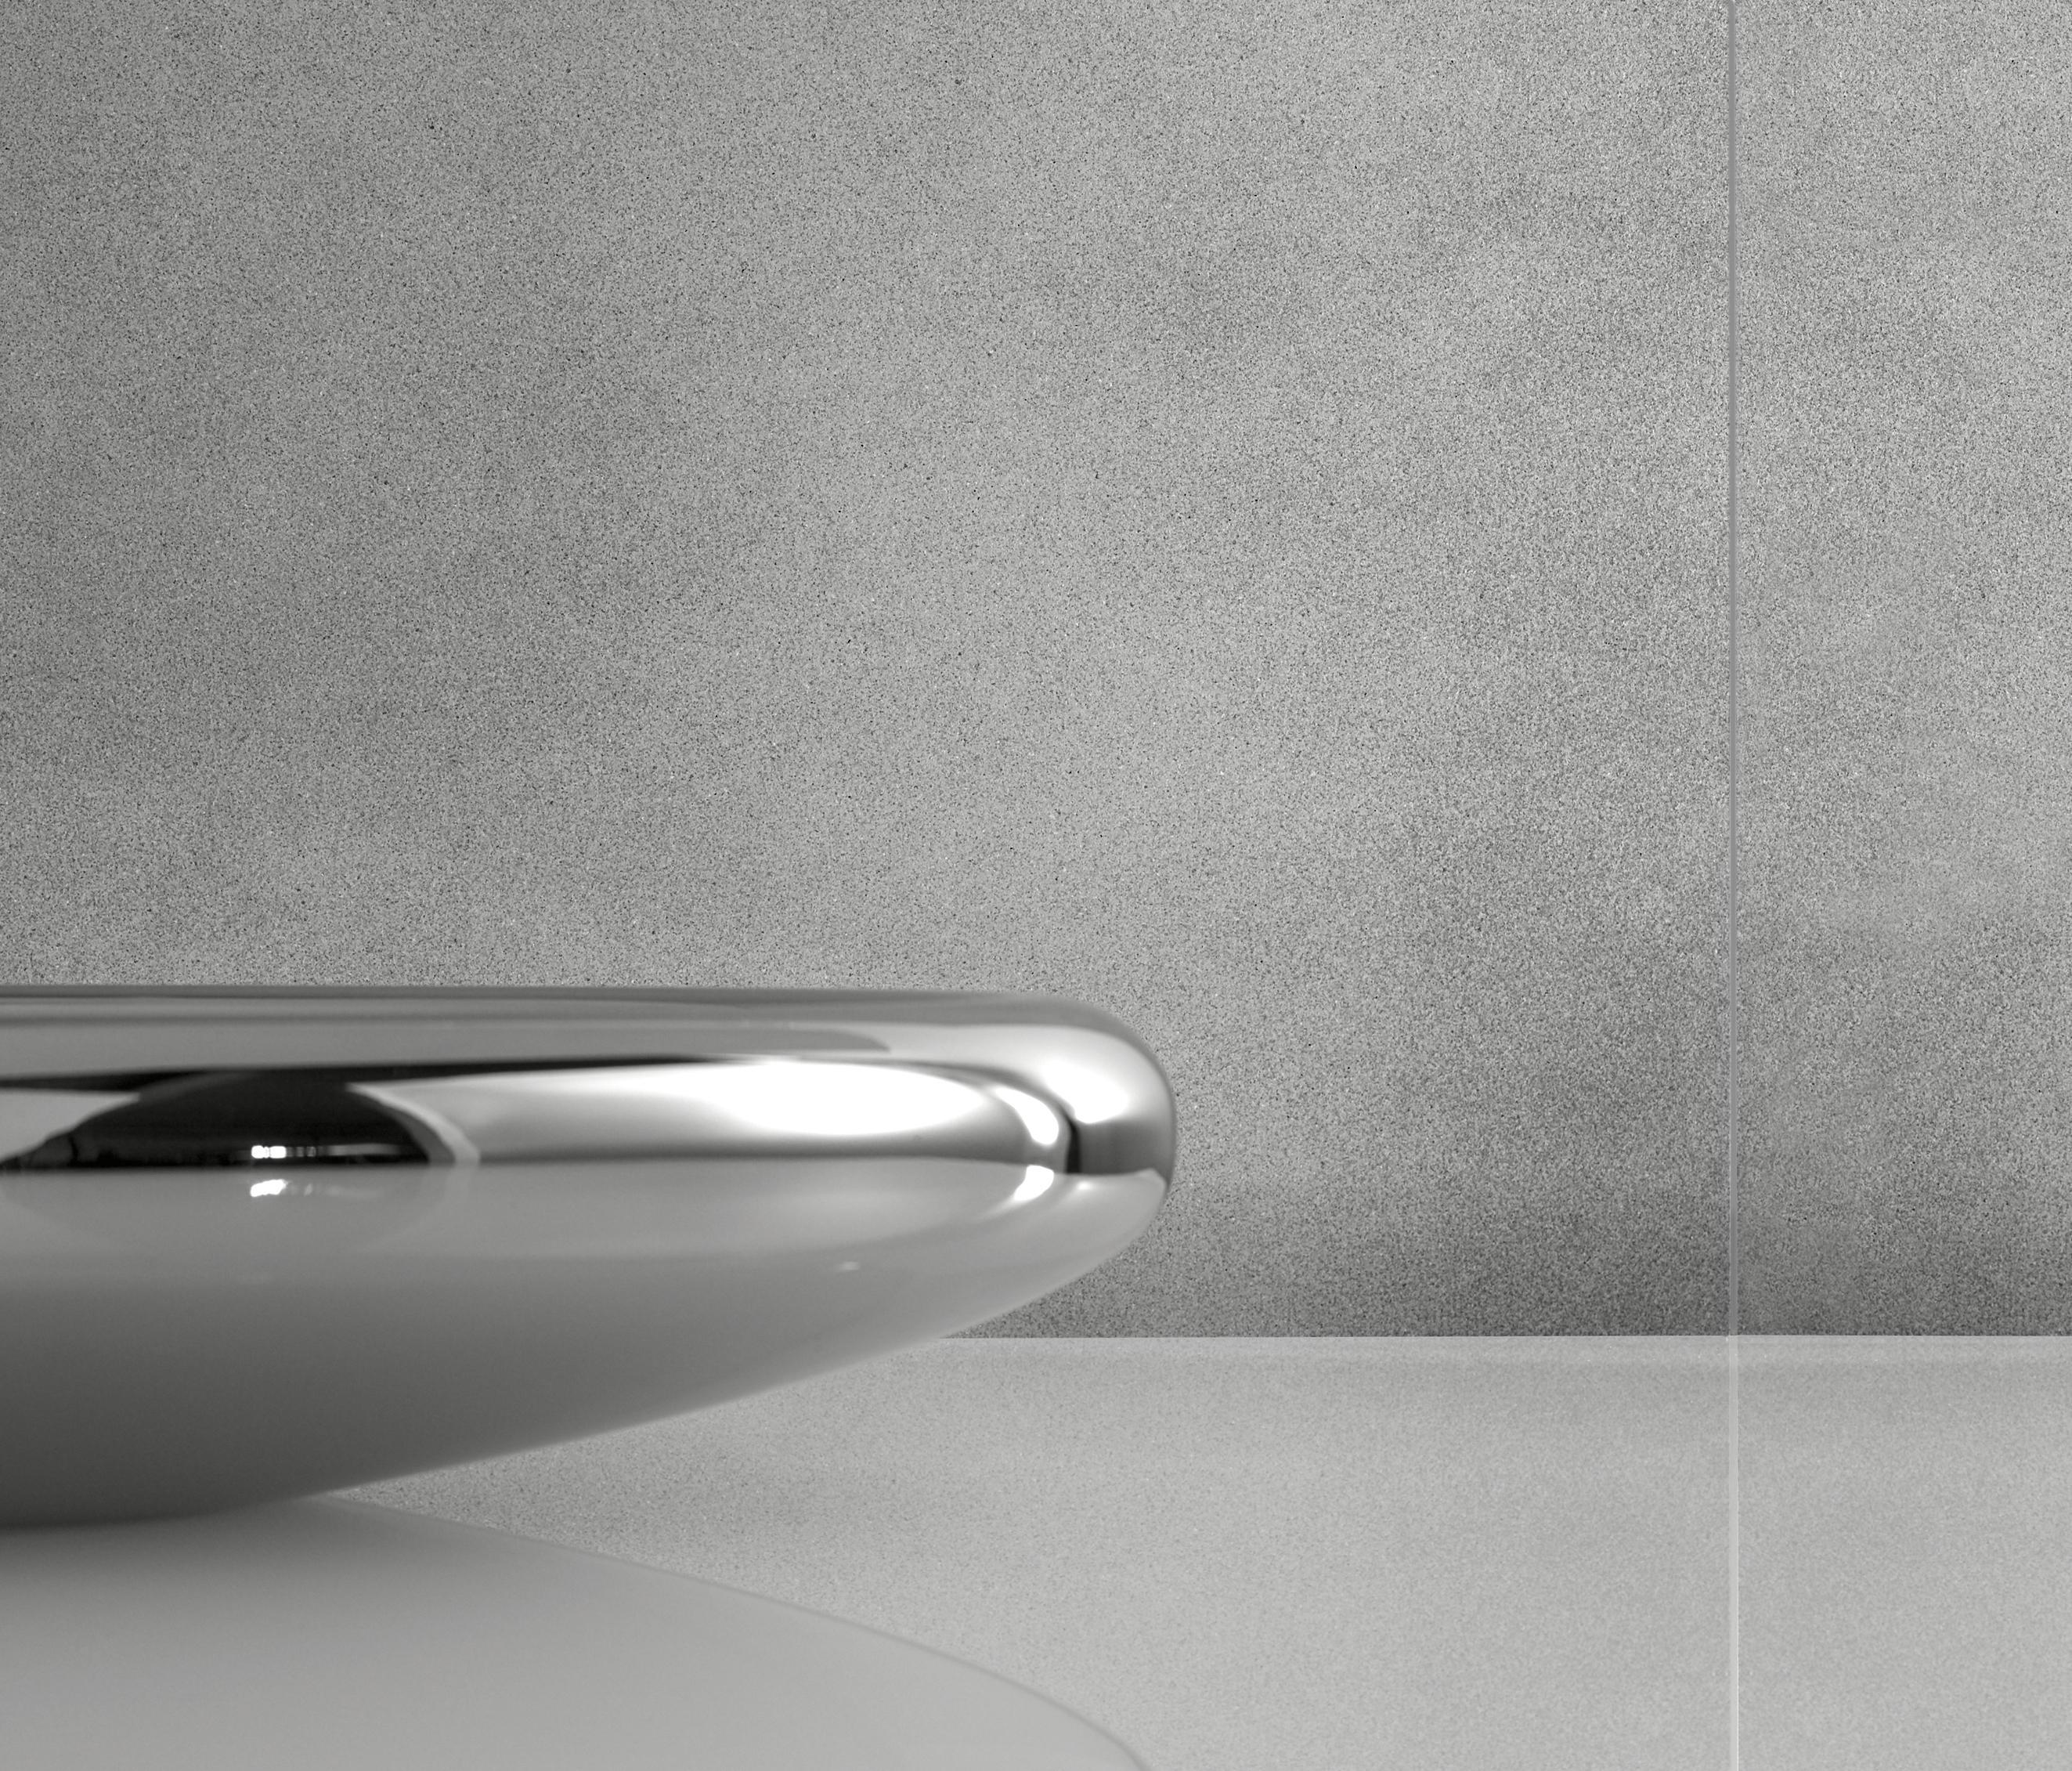 plane zm91 trims by villeroy boch fliesen architonic. Black Bedroom Furniture Sets. Home Design Ideas